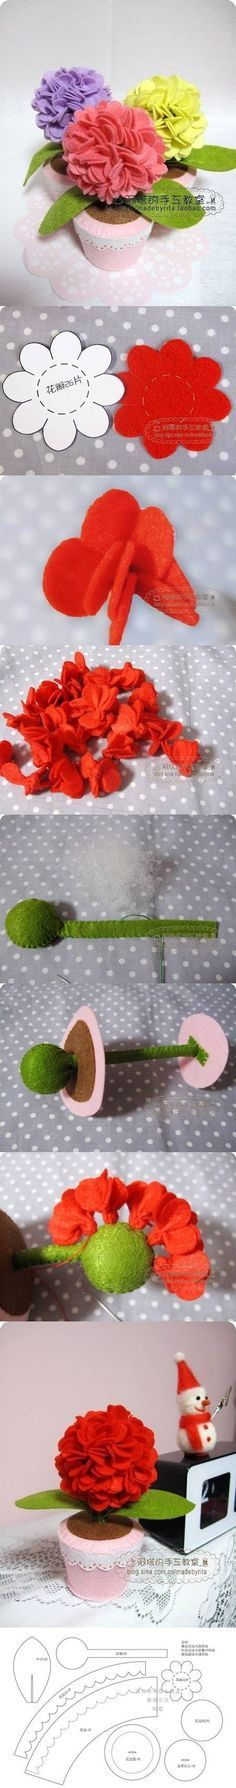 DIY Felt Hydrangea Flower DIY Projects | UsefulDIY.com Follow Us on Facebook ==> http://www.facebook.com/UsefulDiy